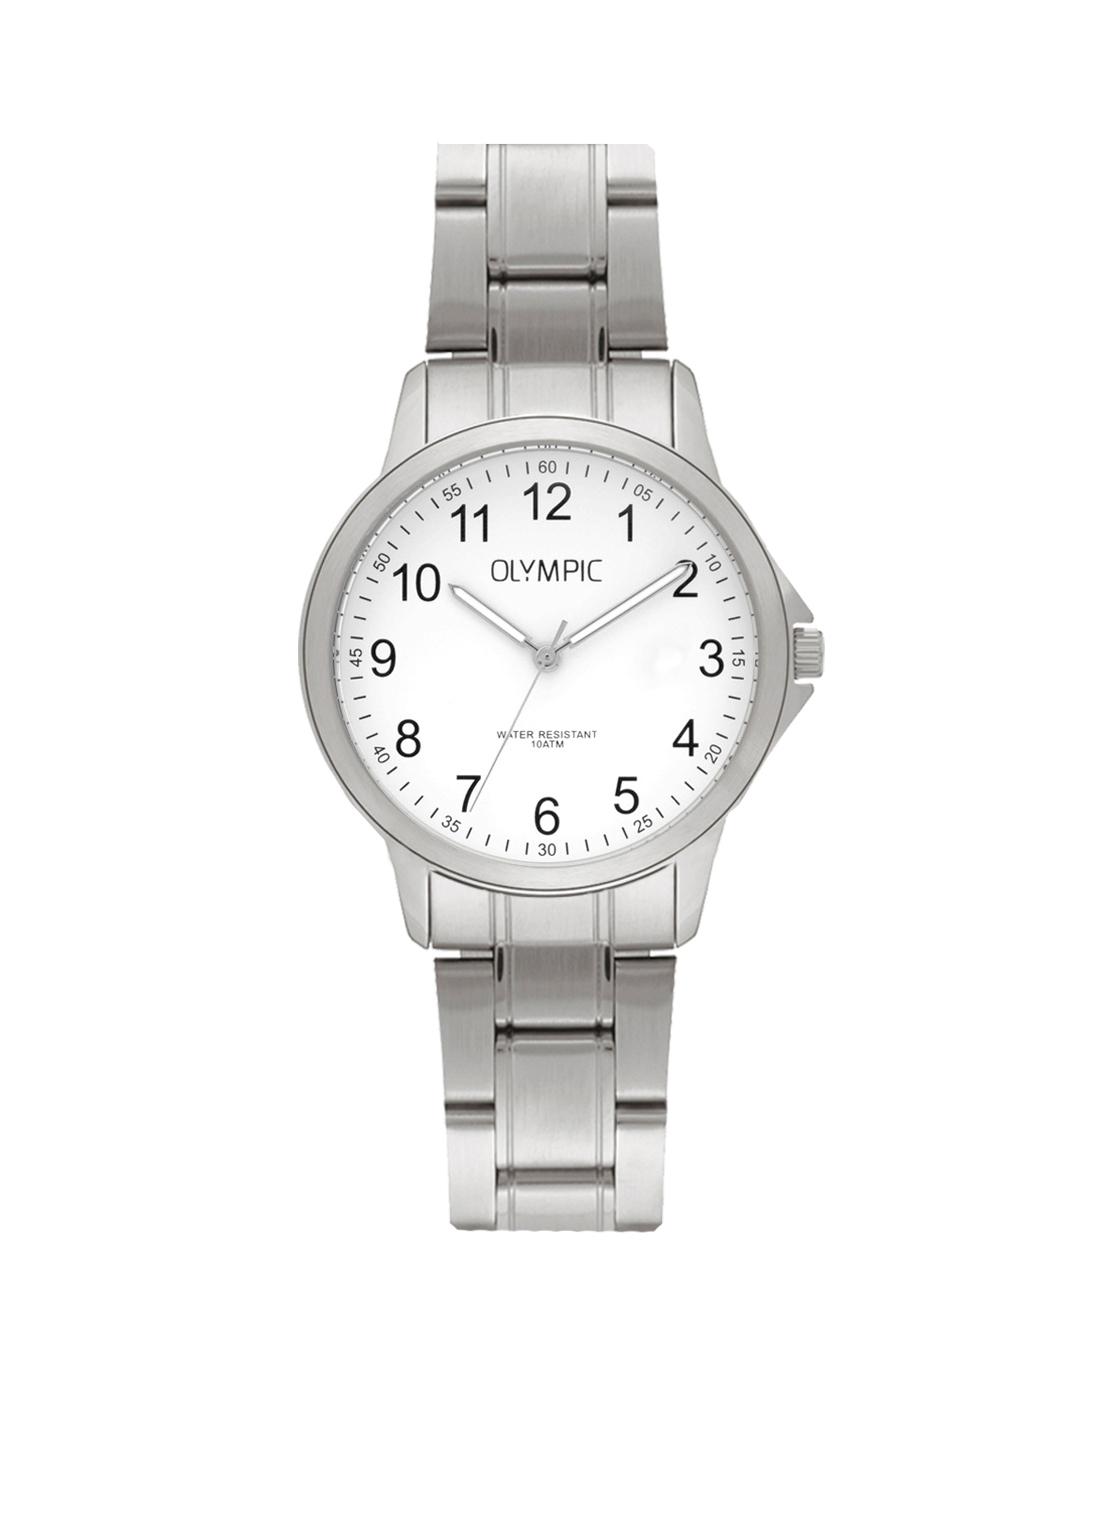 Olympic OL72DSS085 Horloge Baltimore staal zilverkleurig-wit 29 mm